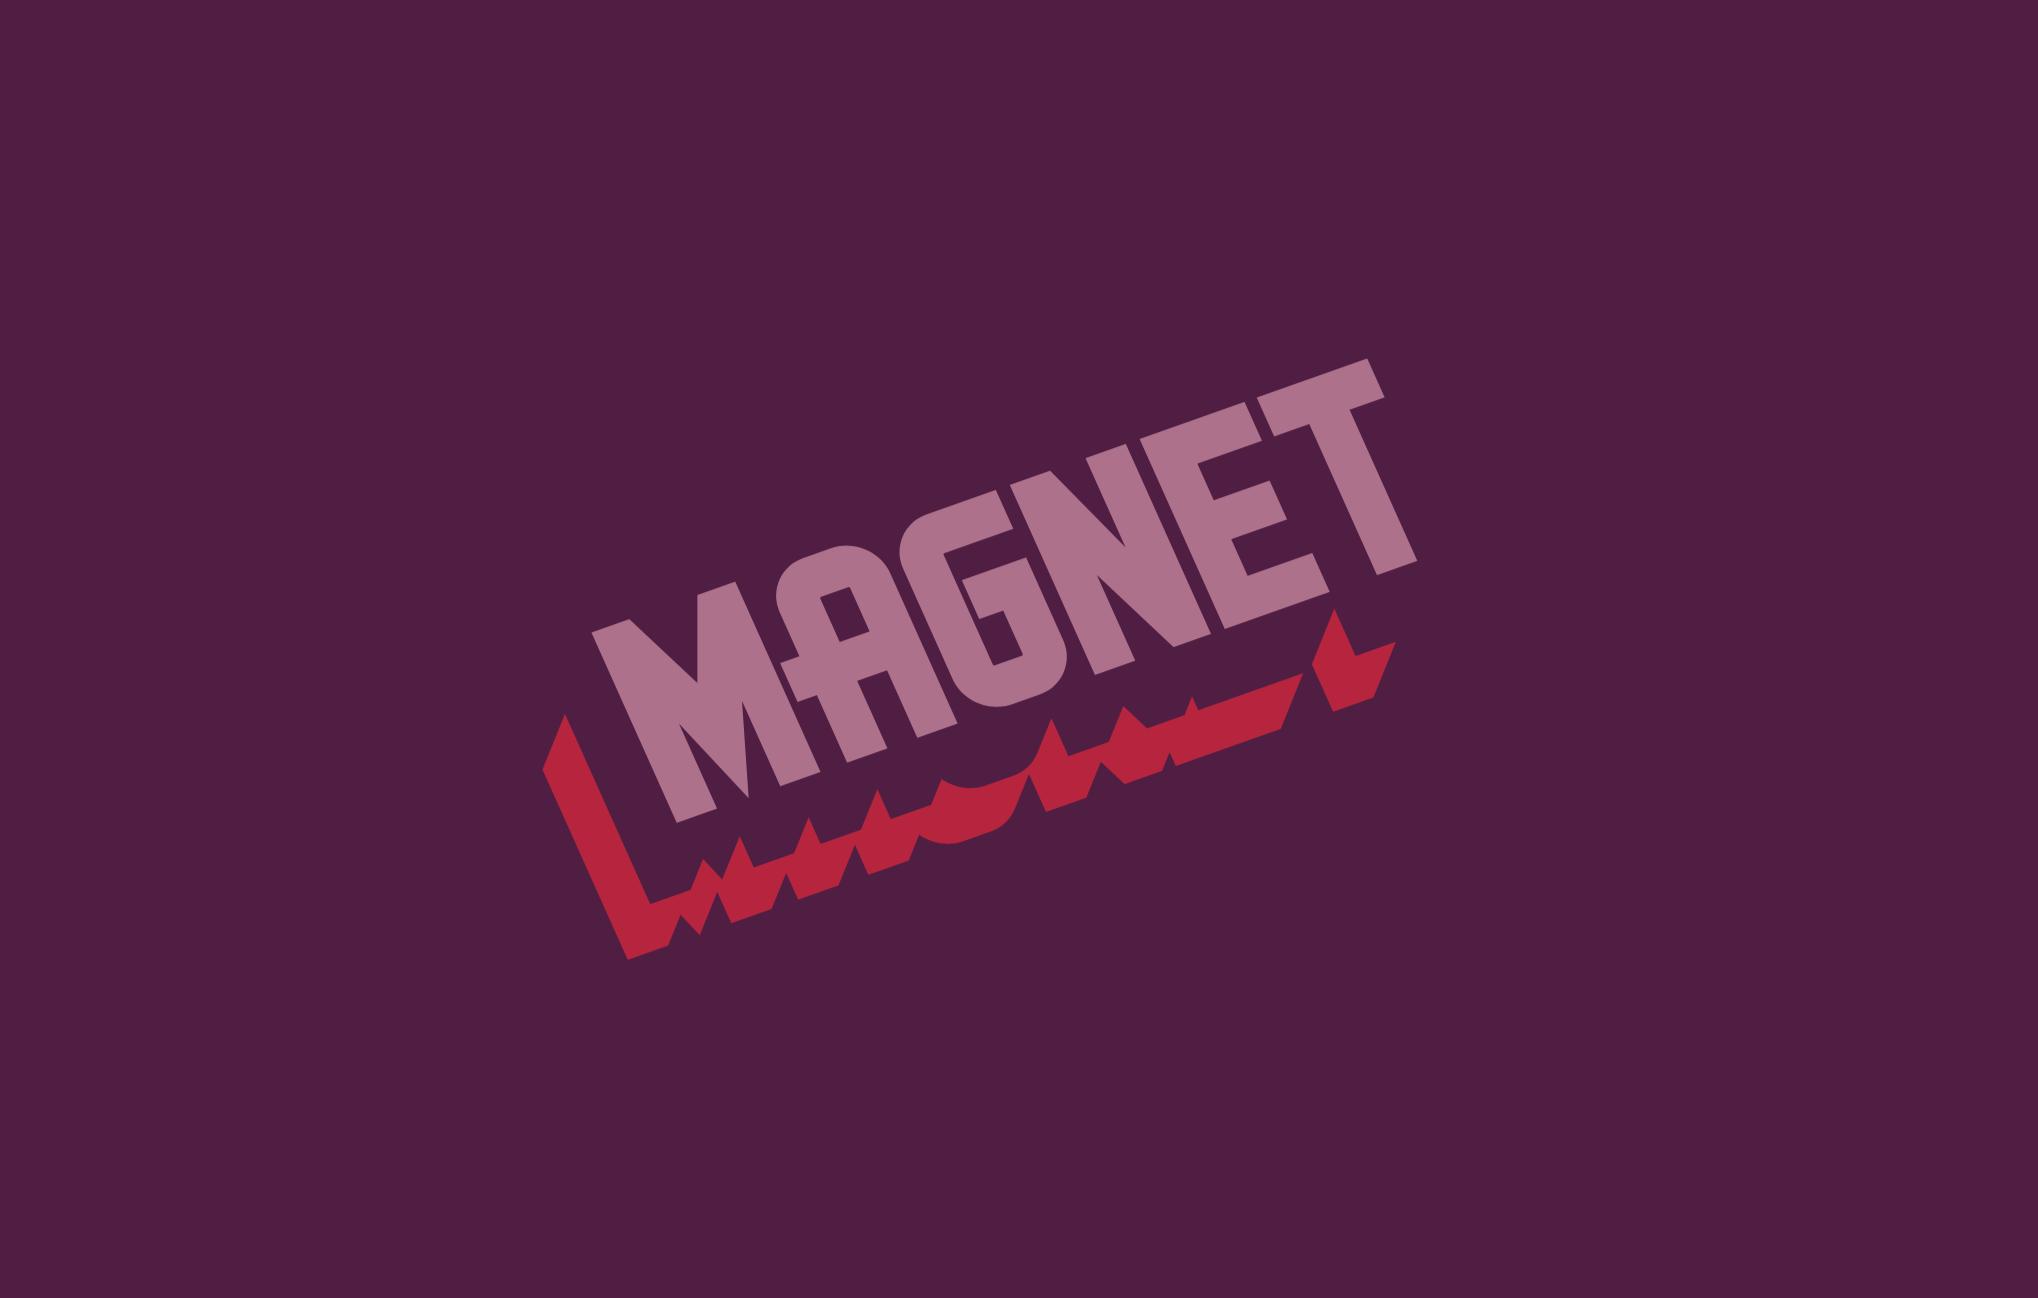 Magnet  Brand Identity, Typography